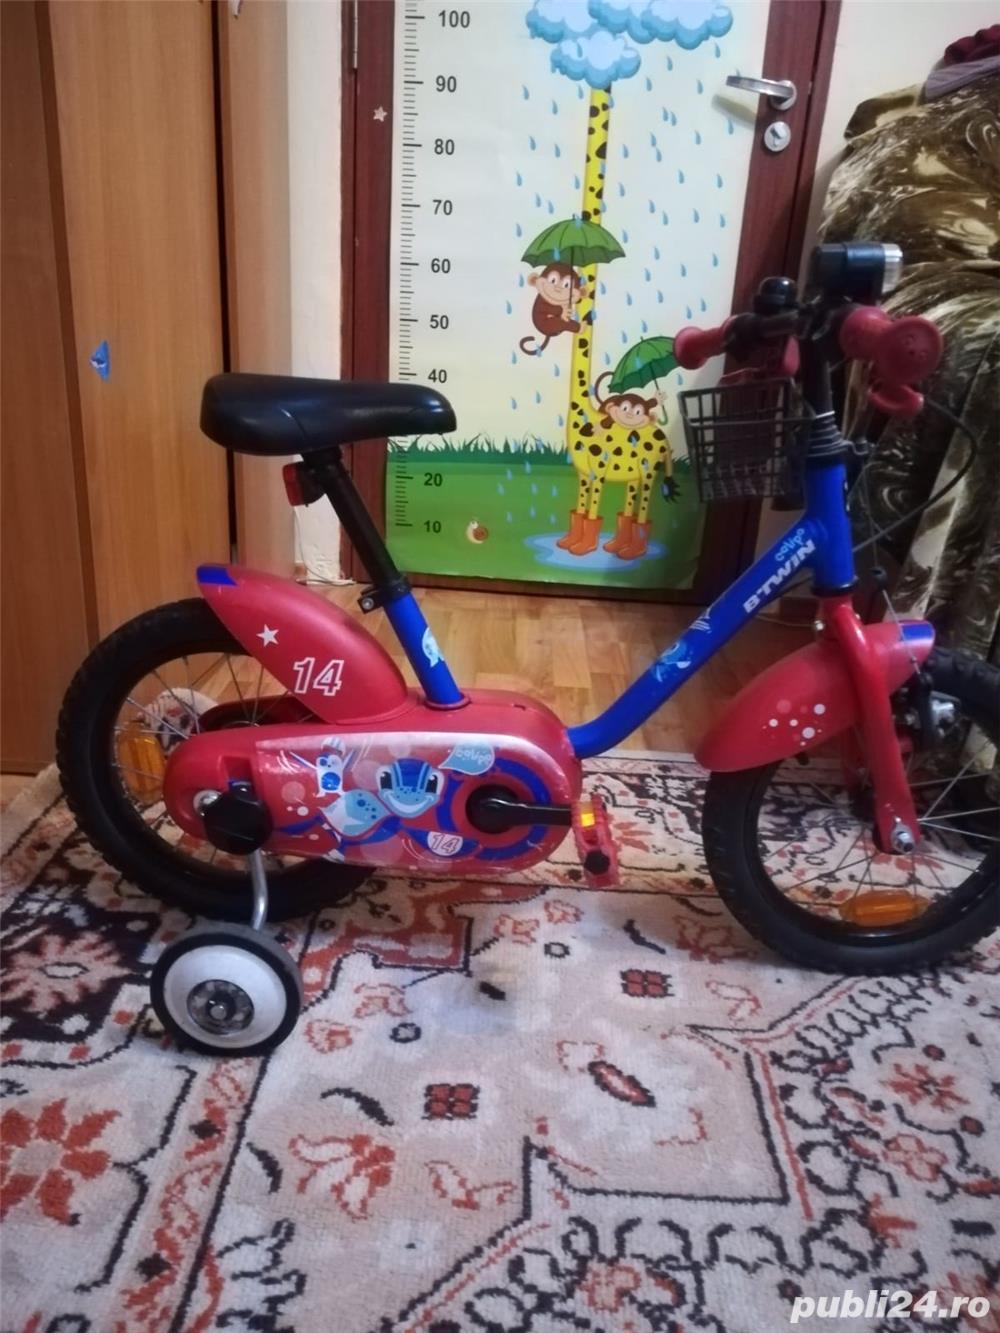 Bicicleta și trotineta pentru copii